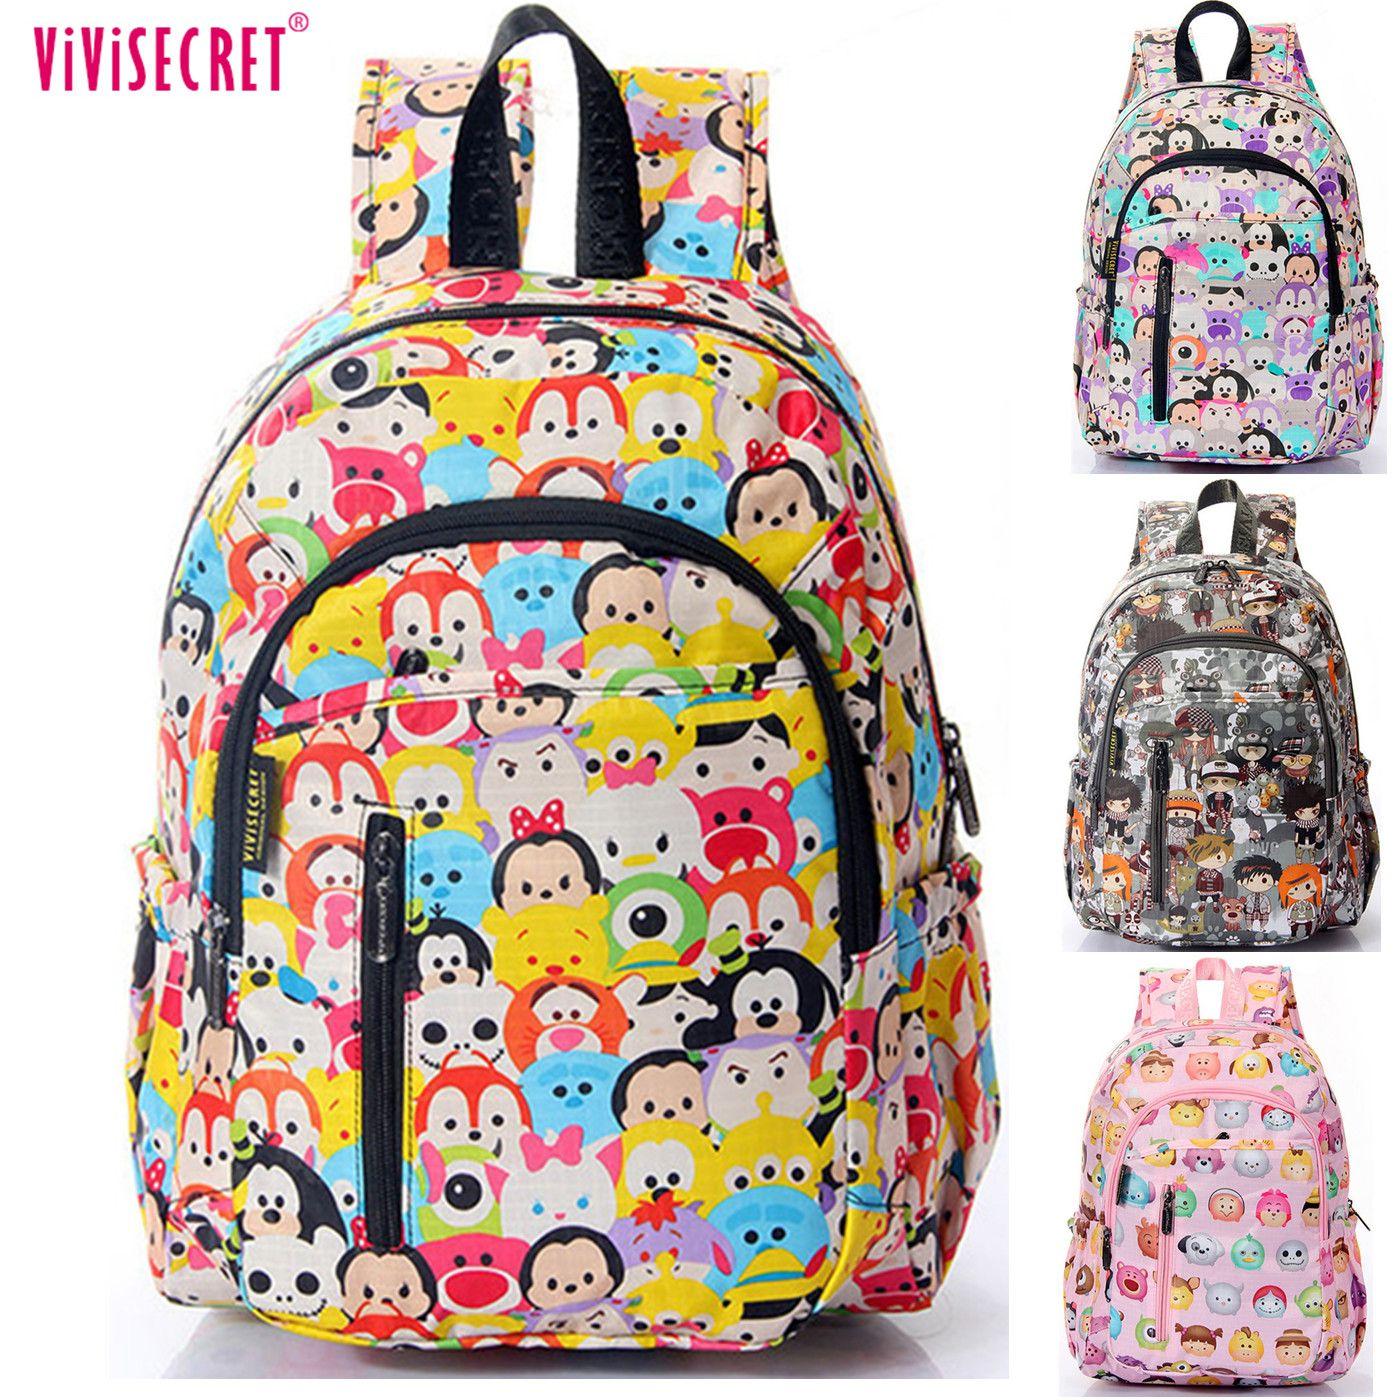 childrens designer bags lm4f  childrens designer bags